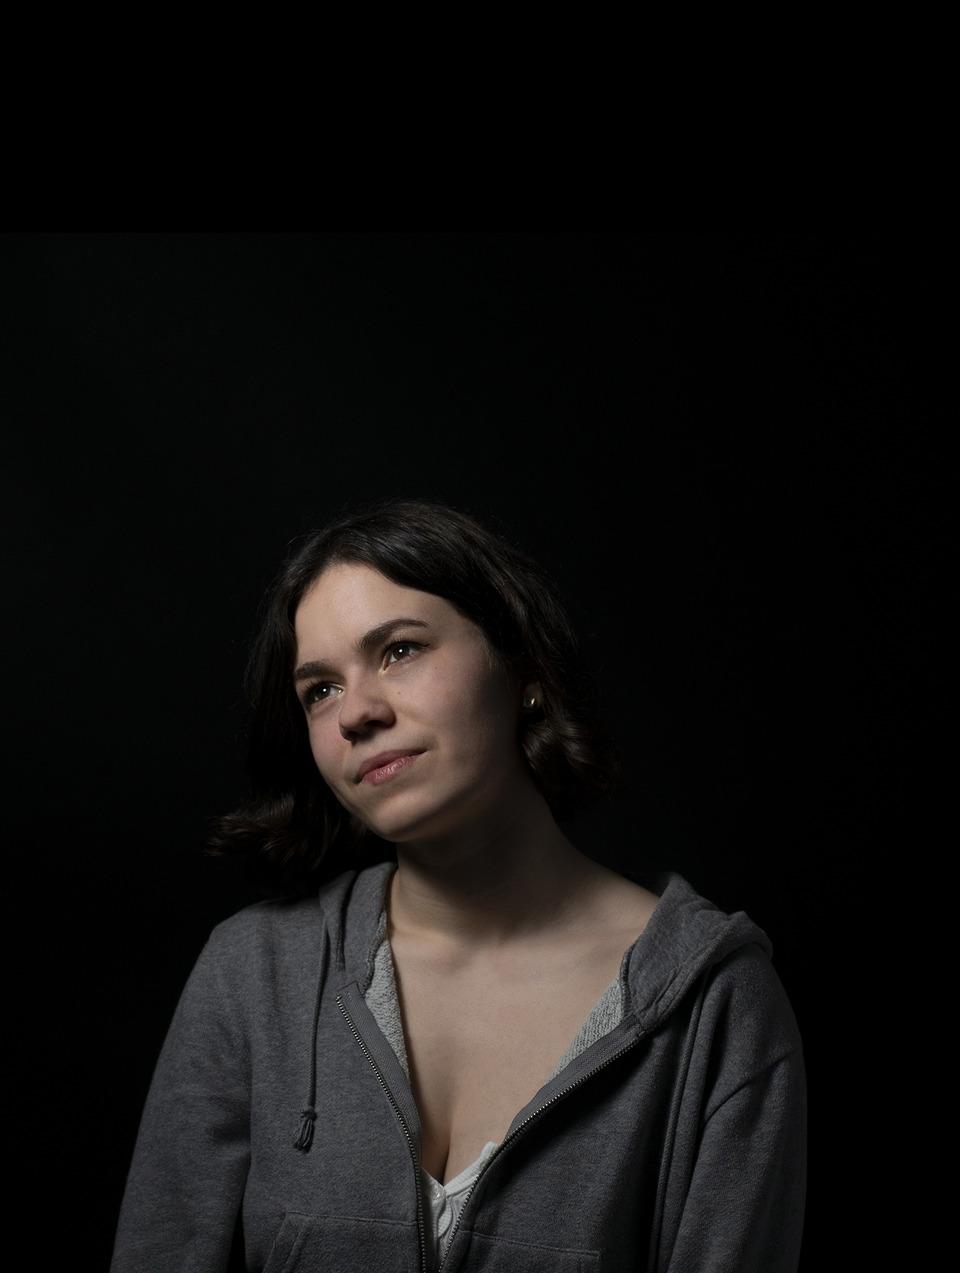 Alessandra Jeanneret